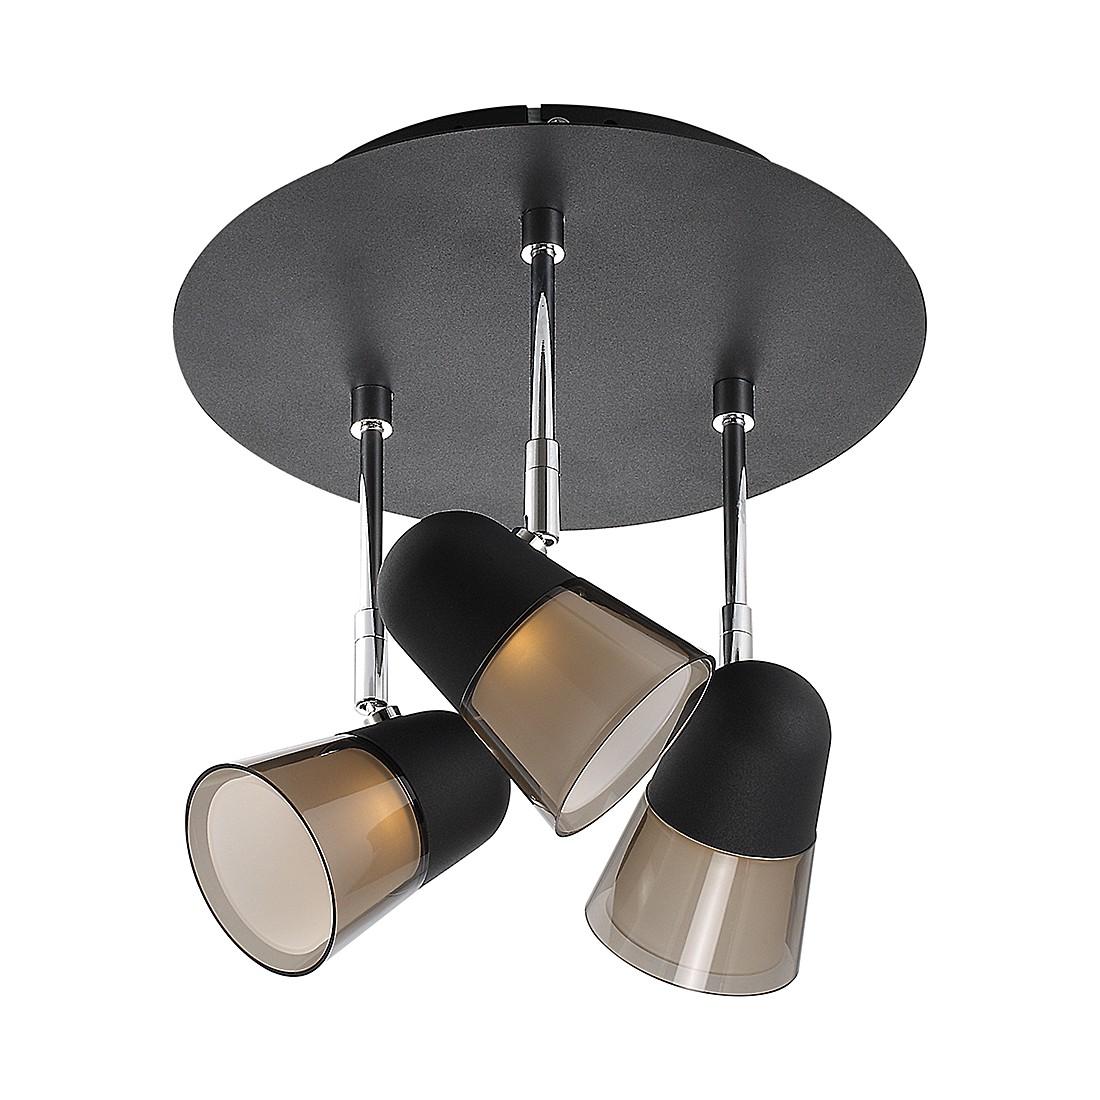 EEK A+, Deckenleuchte Arles – Metal/Kunststoff – Schwarz, Nordlux online bestellen